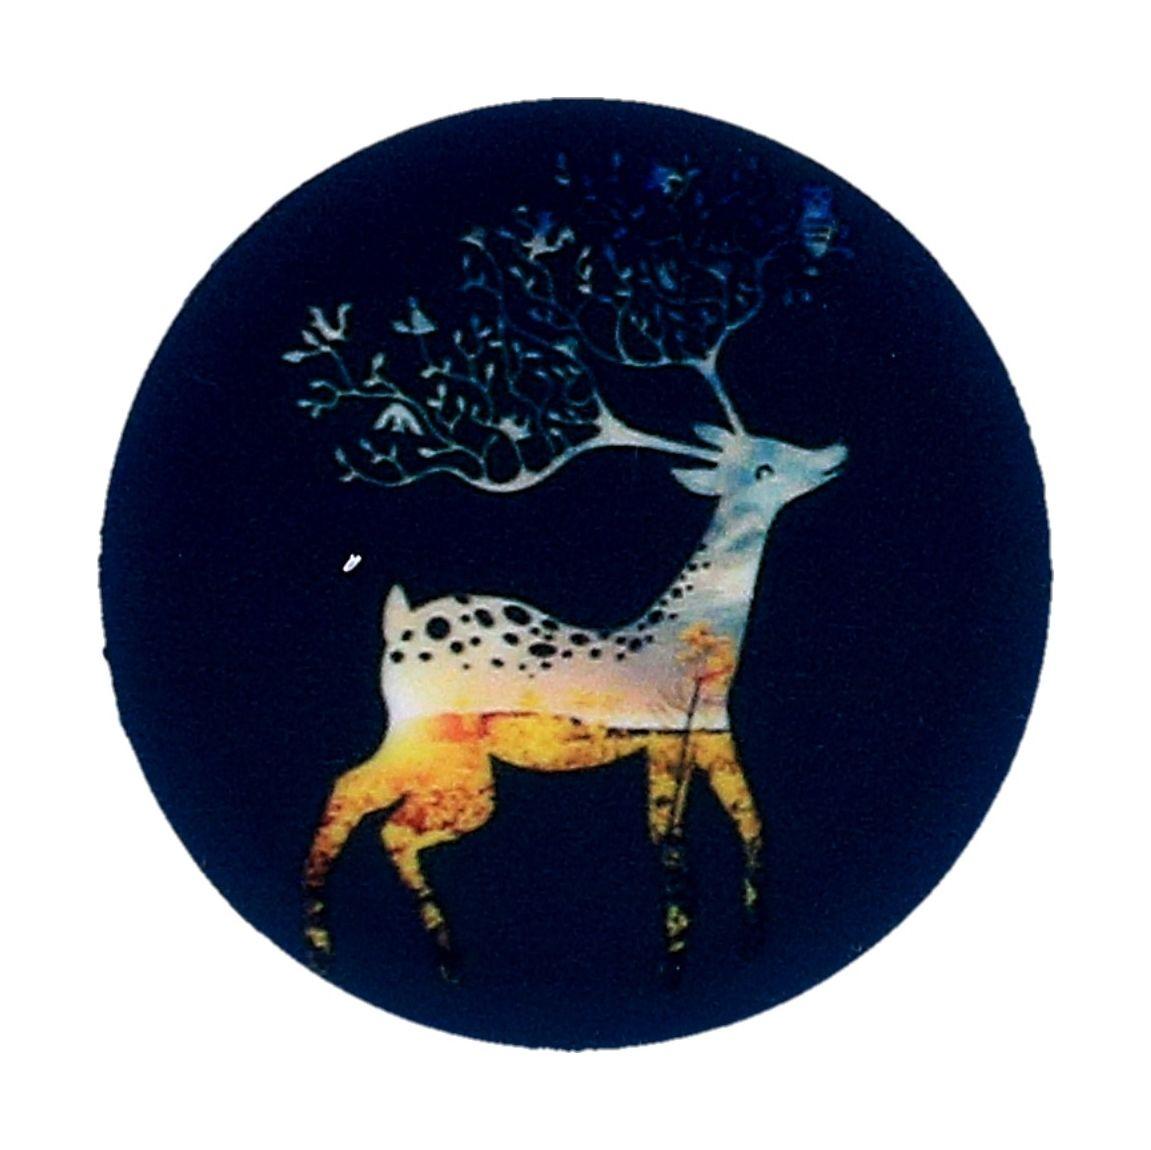 Držák na mobil TopQ PopSocket Deer 36302